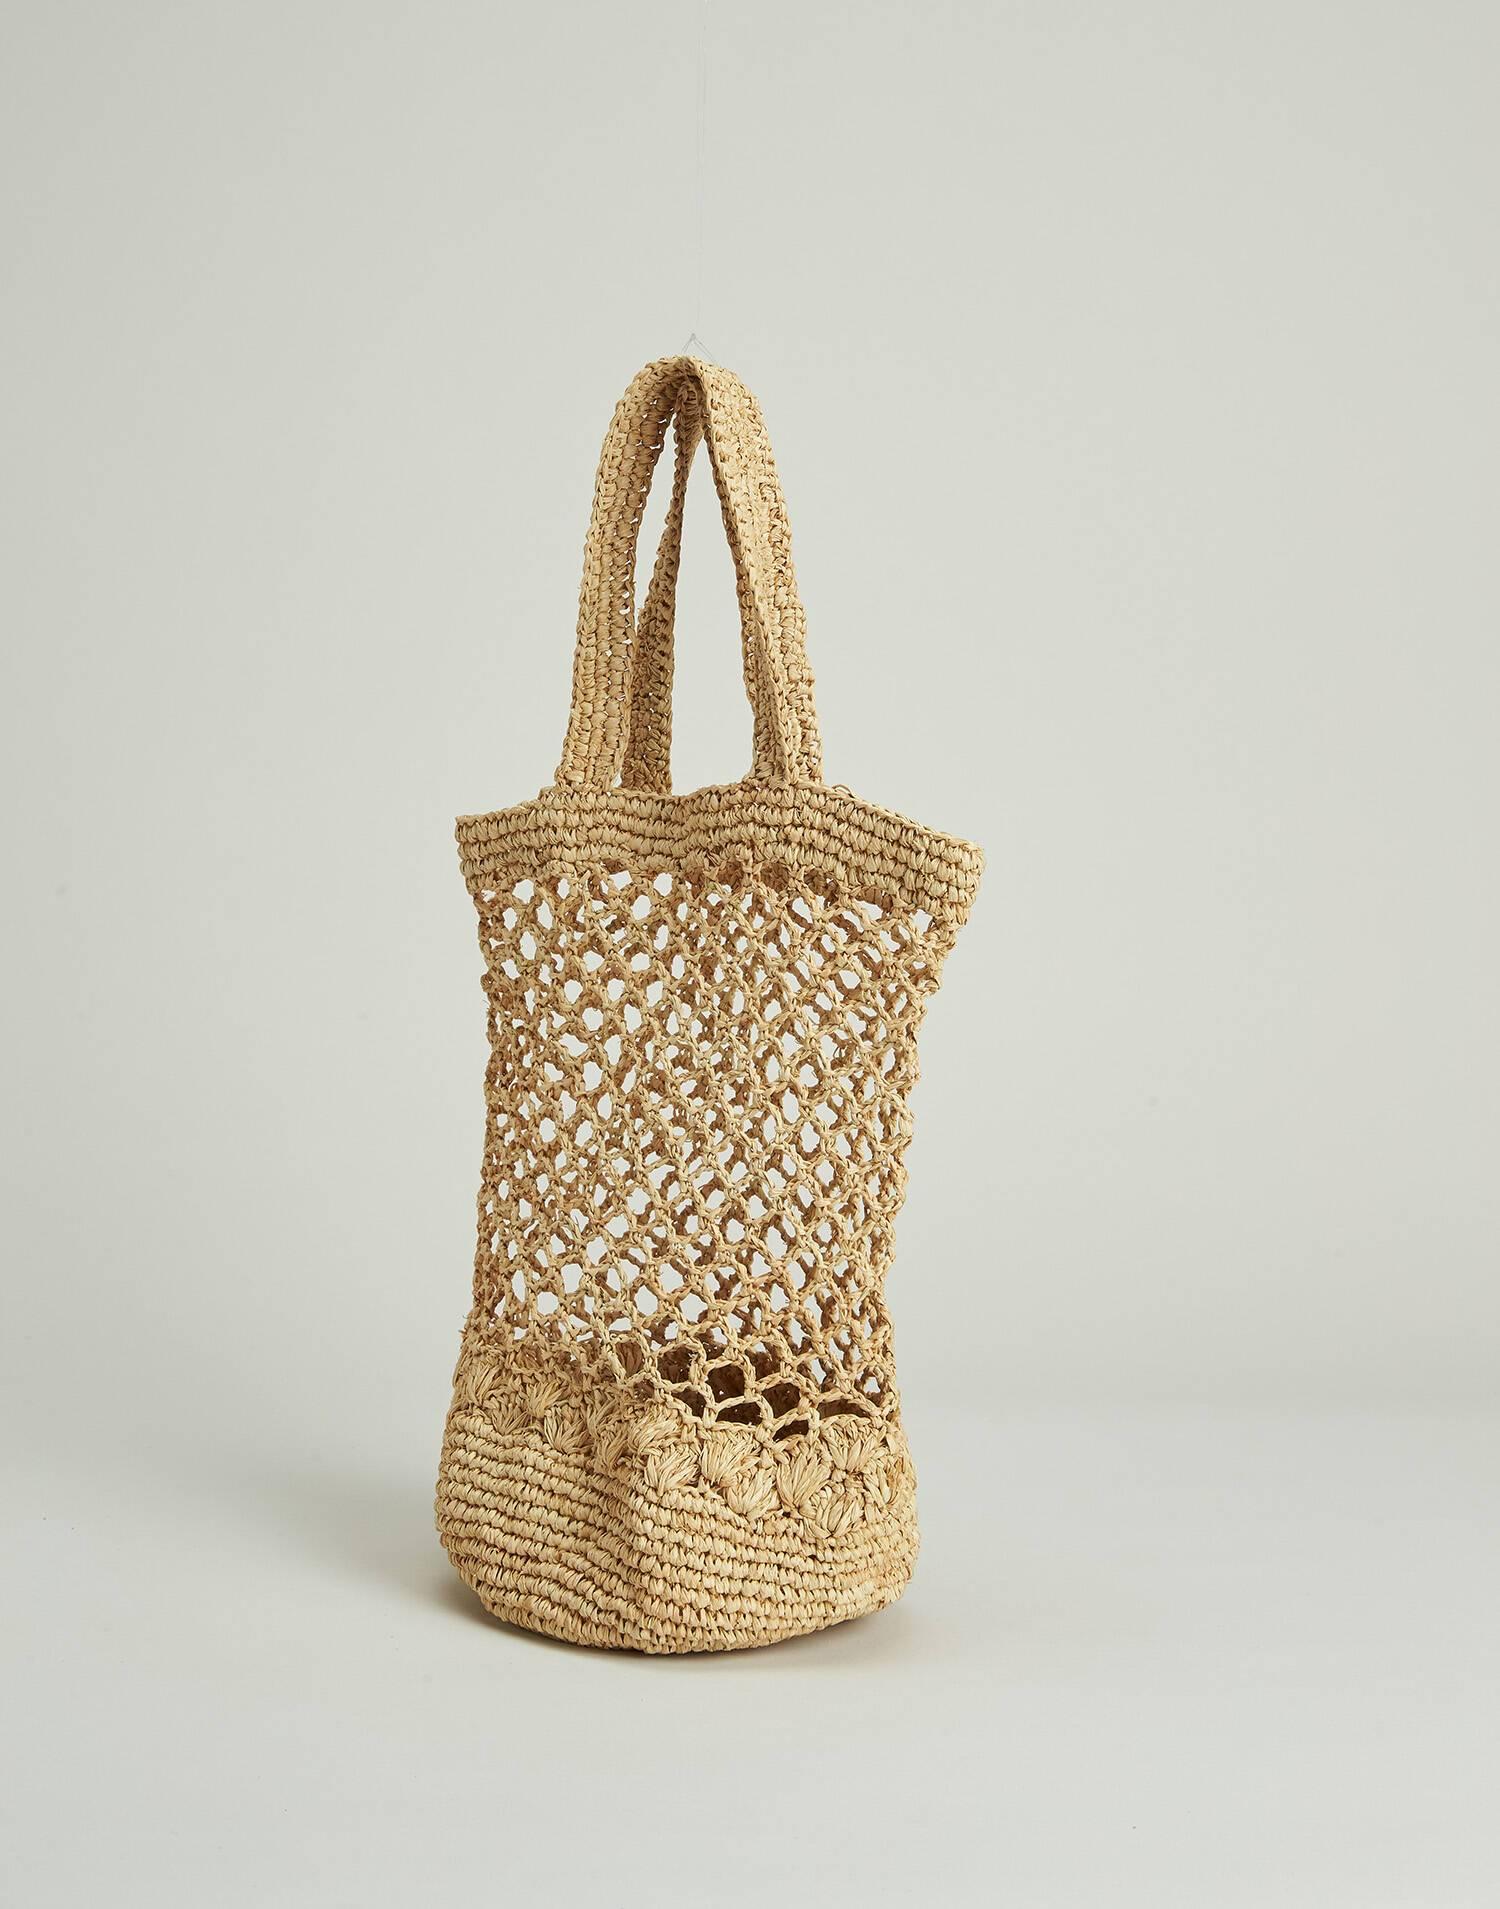 Openwork raffia bag